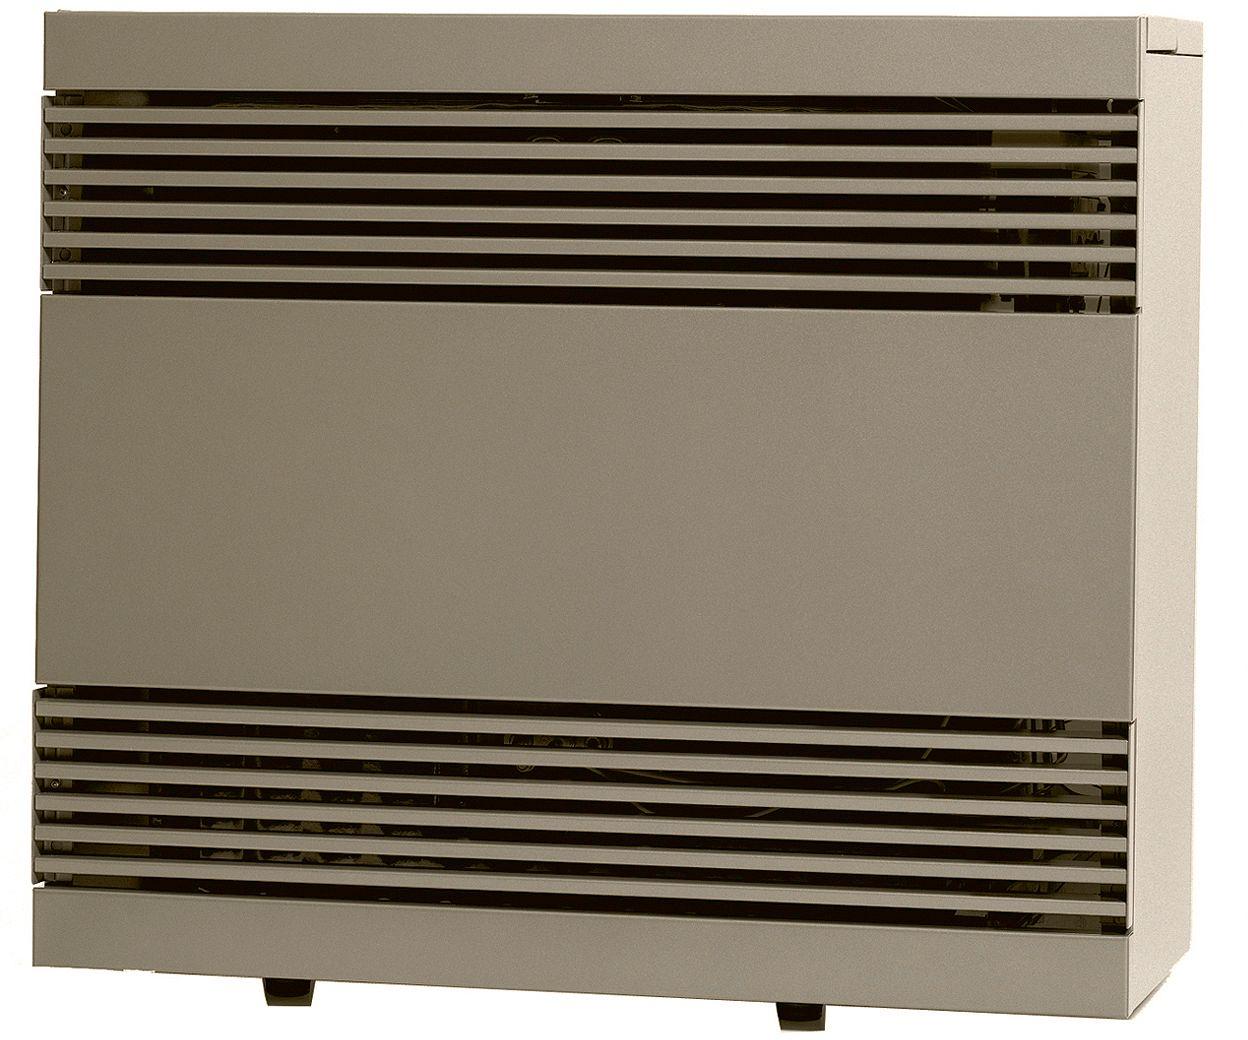 CONV.GAZ FLANDR(MUR.) M9000HR LUXE BEIGE